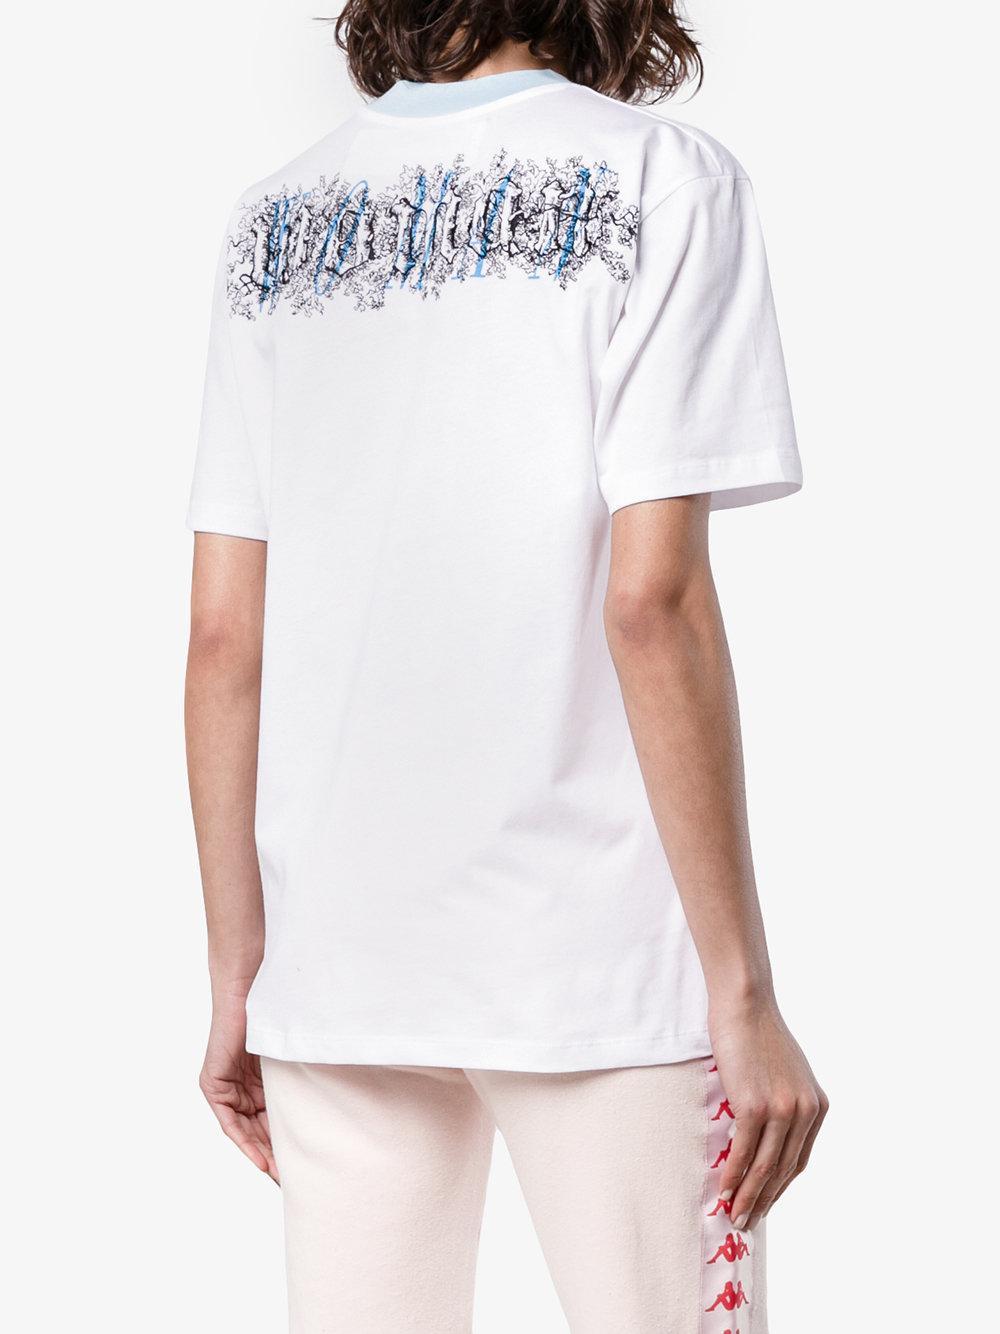 4c289fc9 Off-White c/o Virgil Abloh Tribute 1 Princess Diana T-shirt in White ...